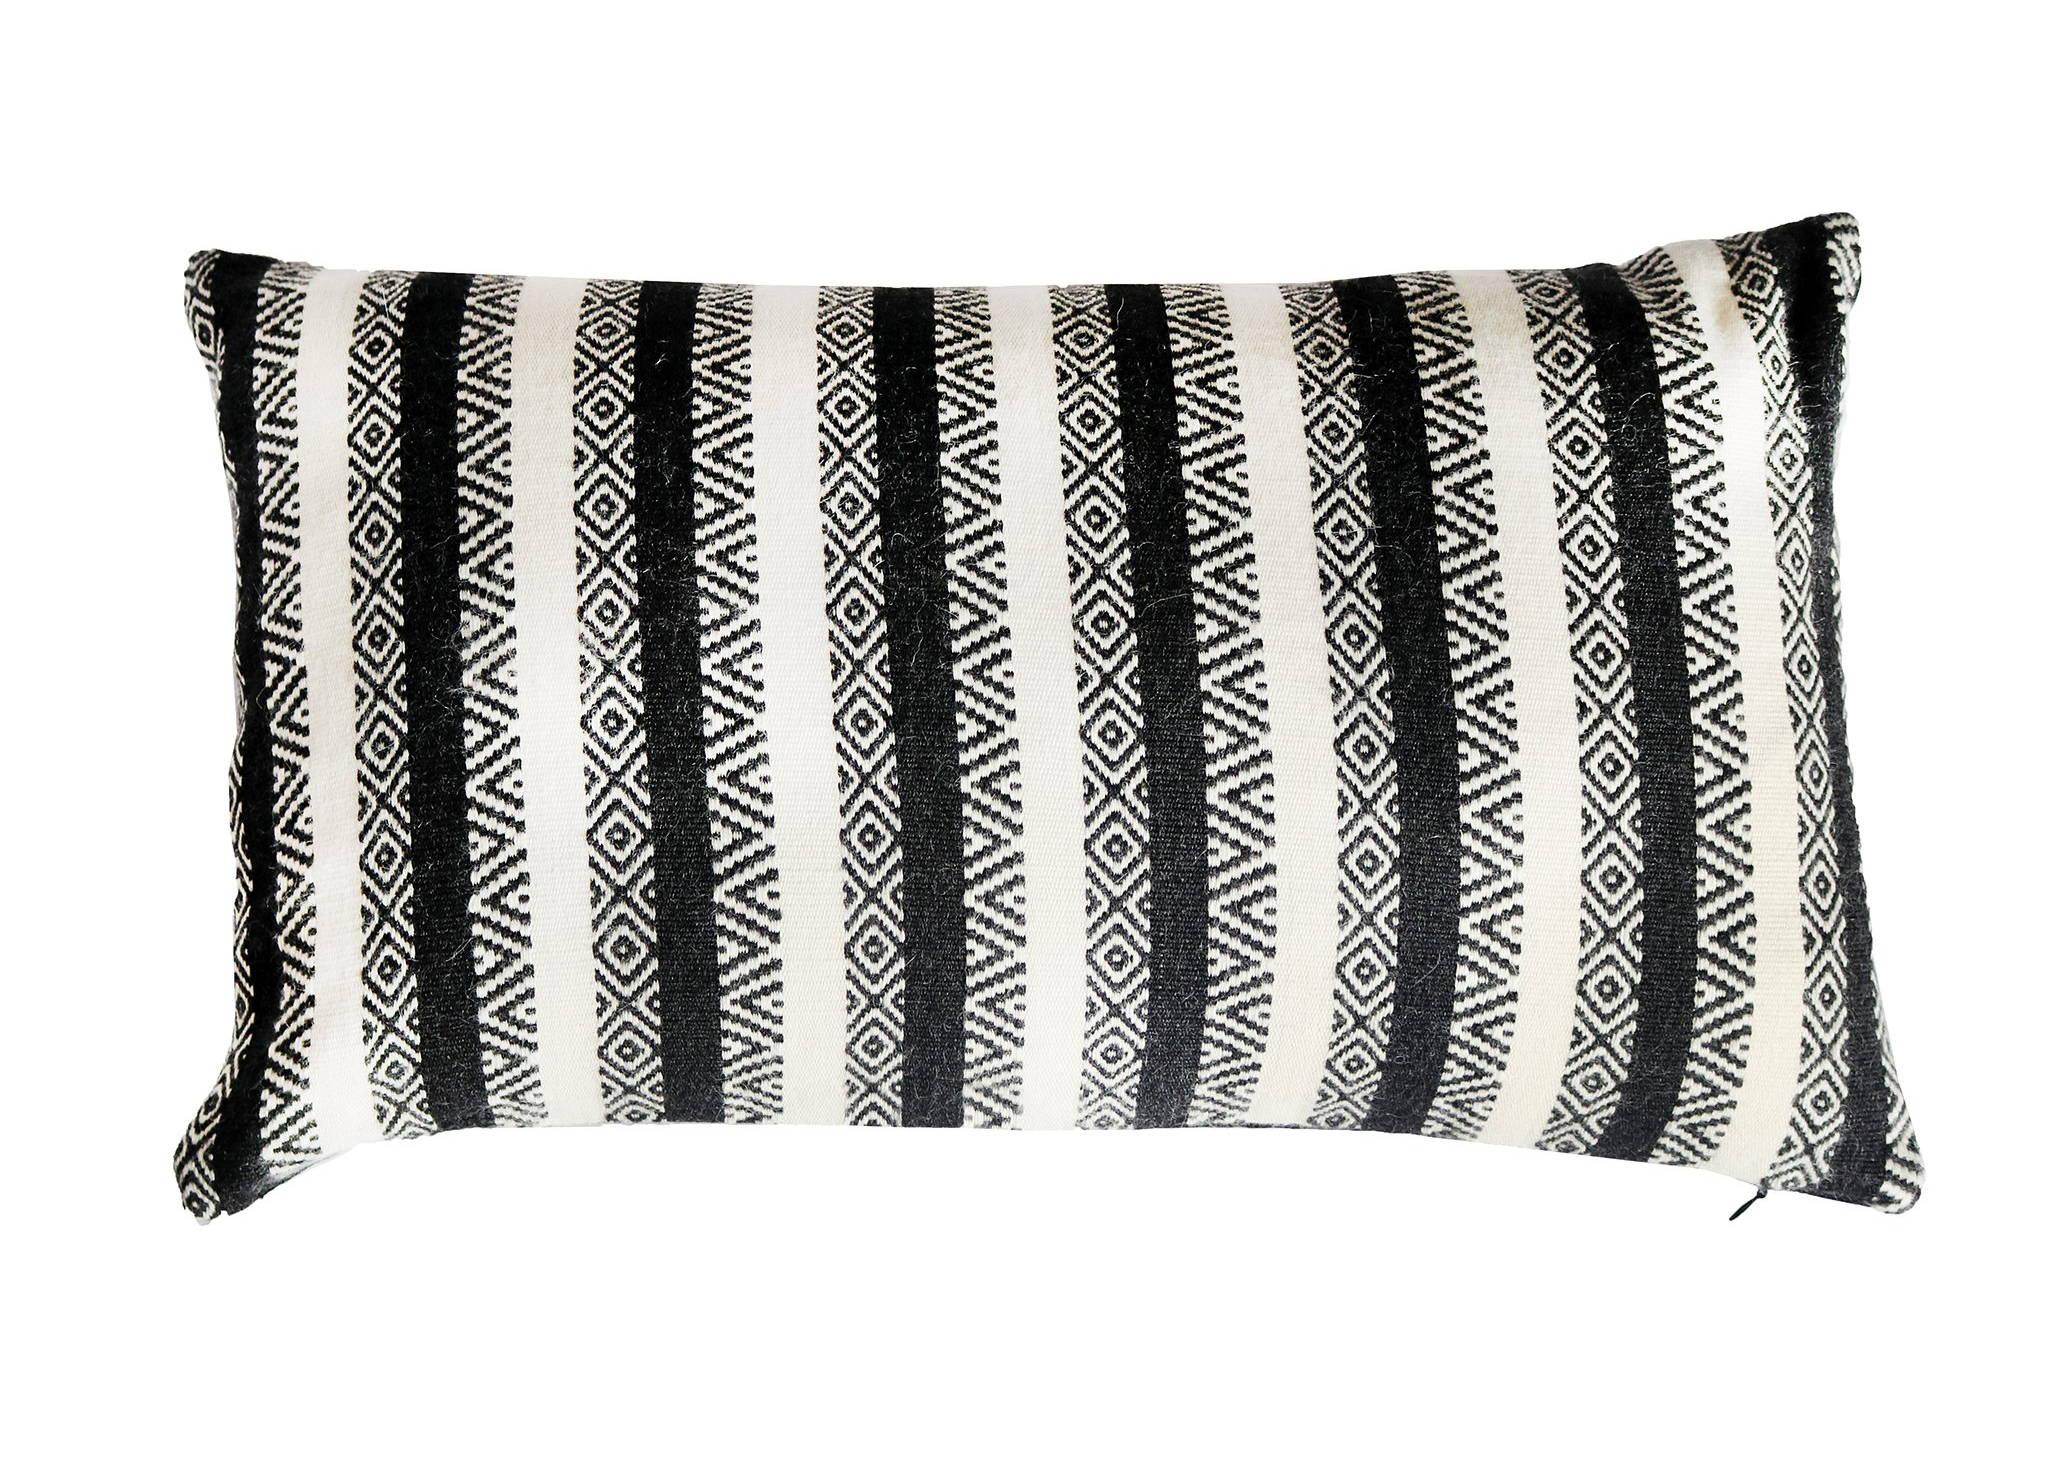 jacquard-loomed alpaca diamond stripe pillow in black & white - Stick & Ball